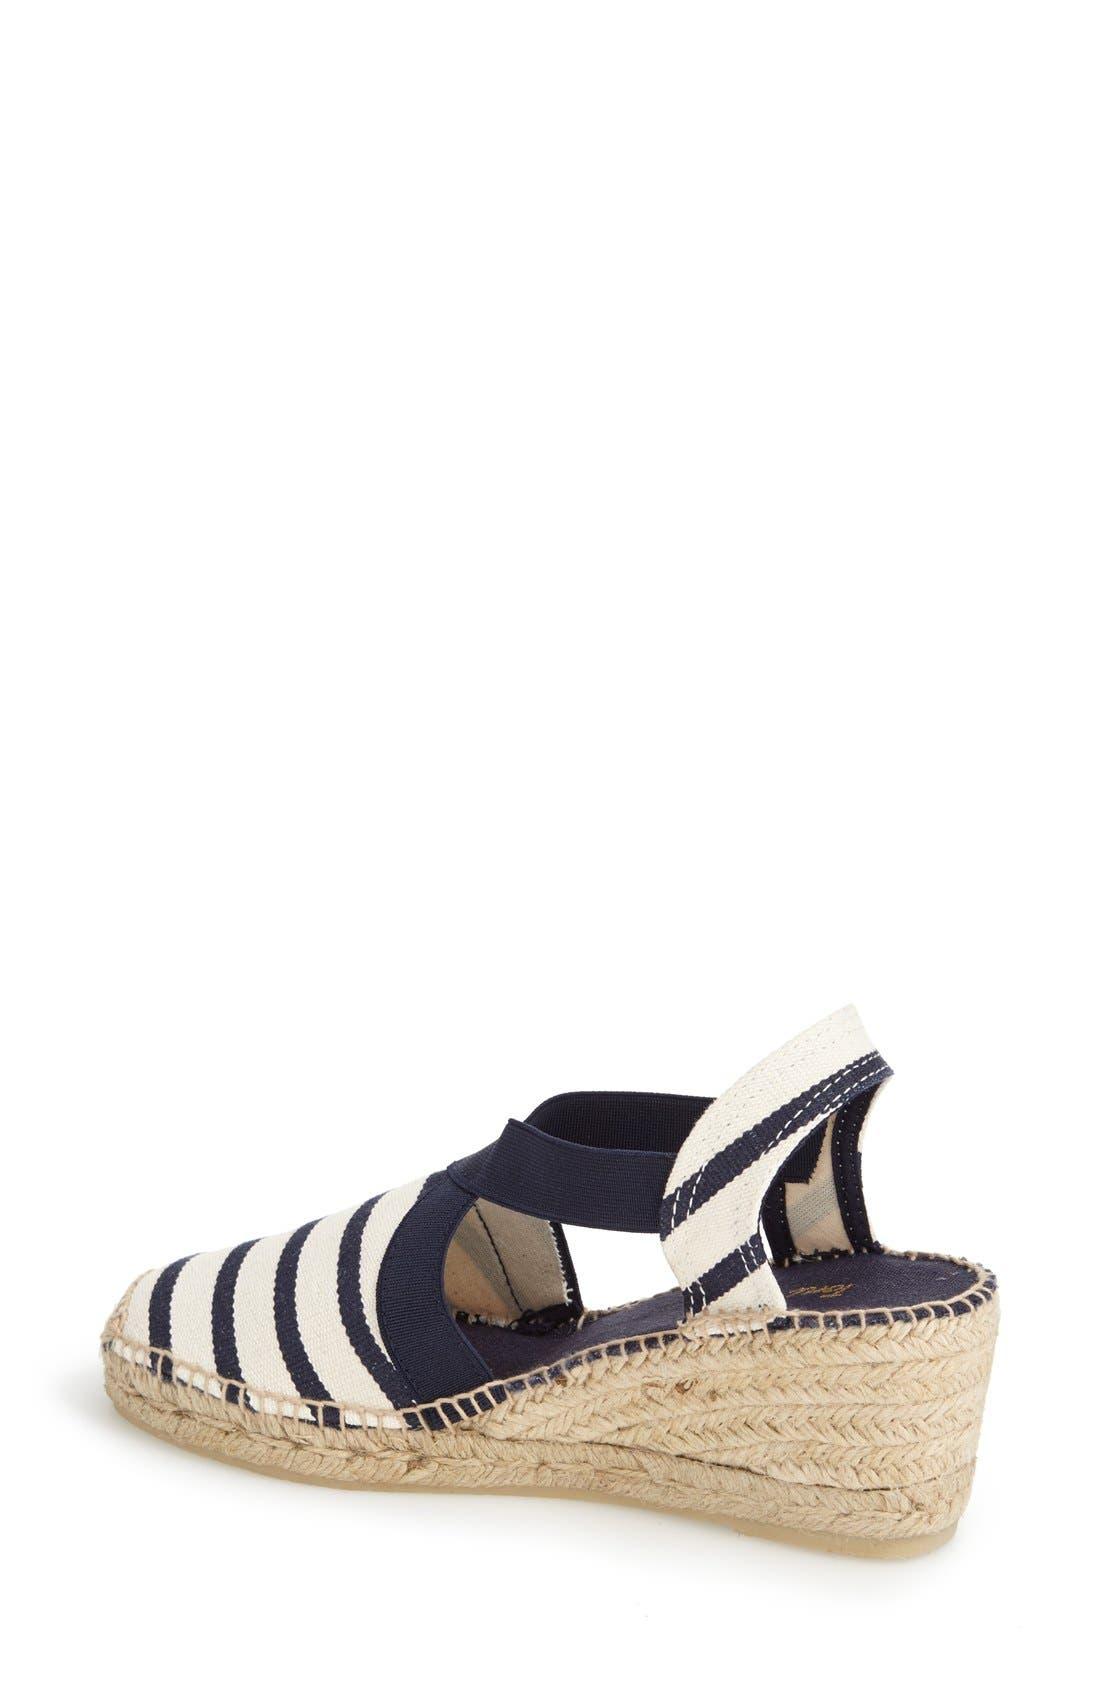 'Tarbes' Espadrille Wedge Sandal,                             Alternate thumbnail 2, color,                             BLUE